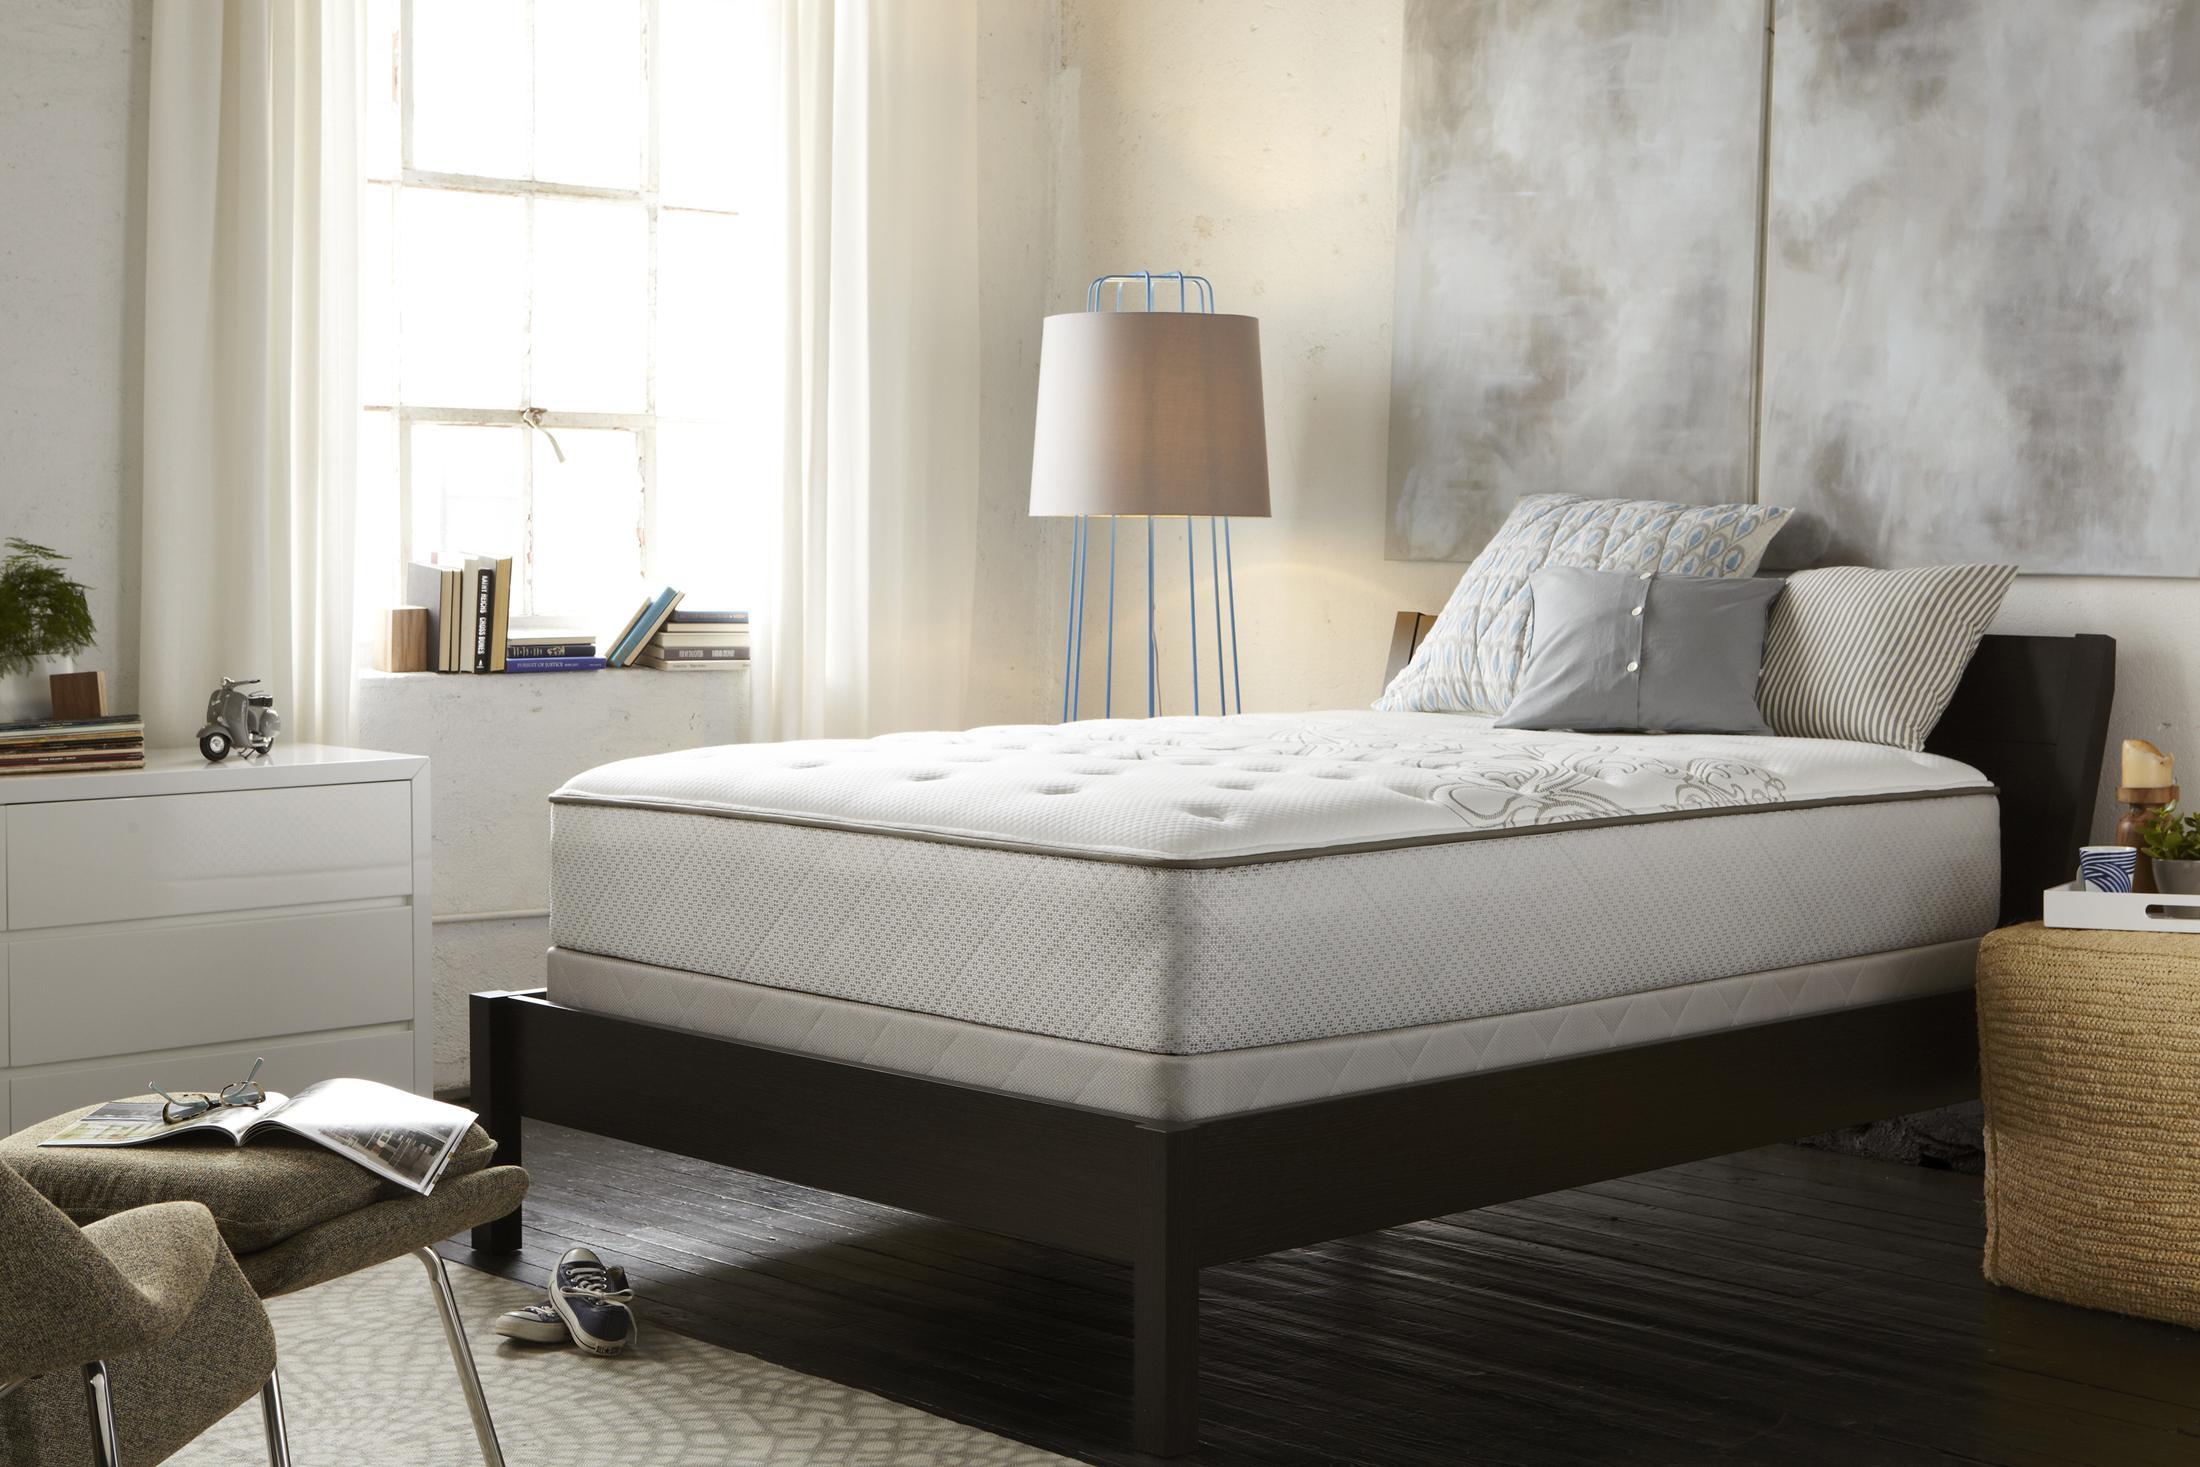 Sealy Posturepedic Classic 2013 Twin Cushion Firm Mattress